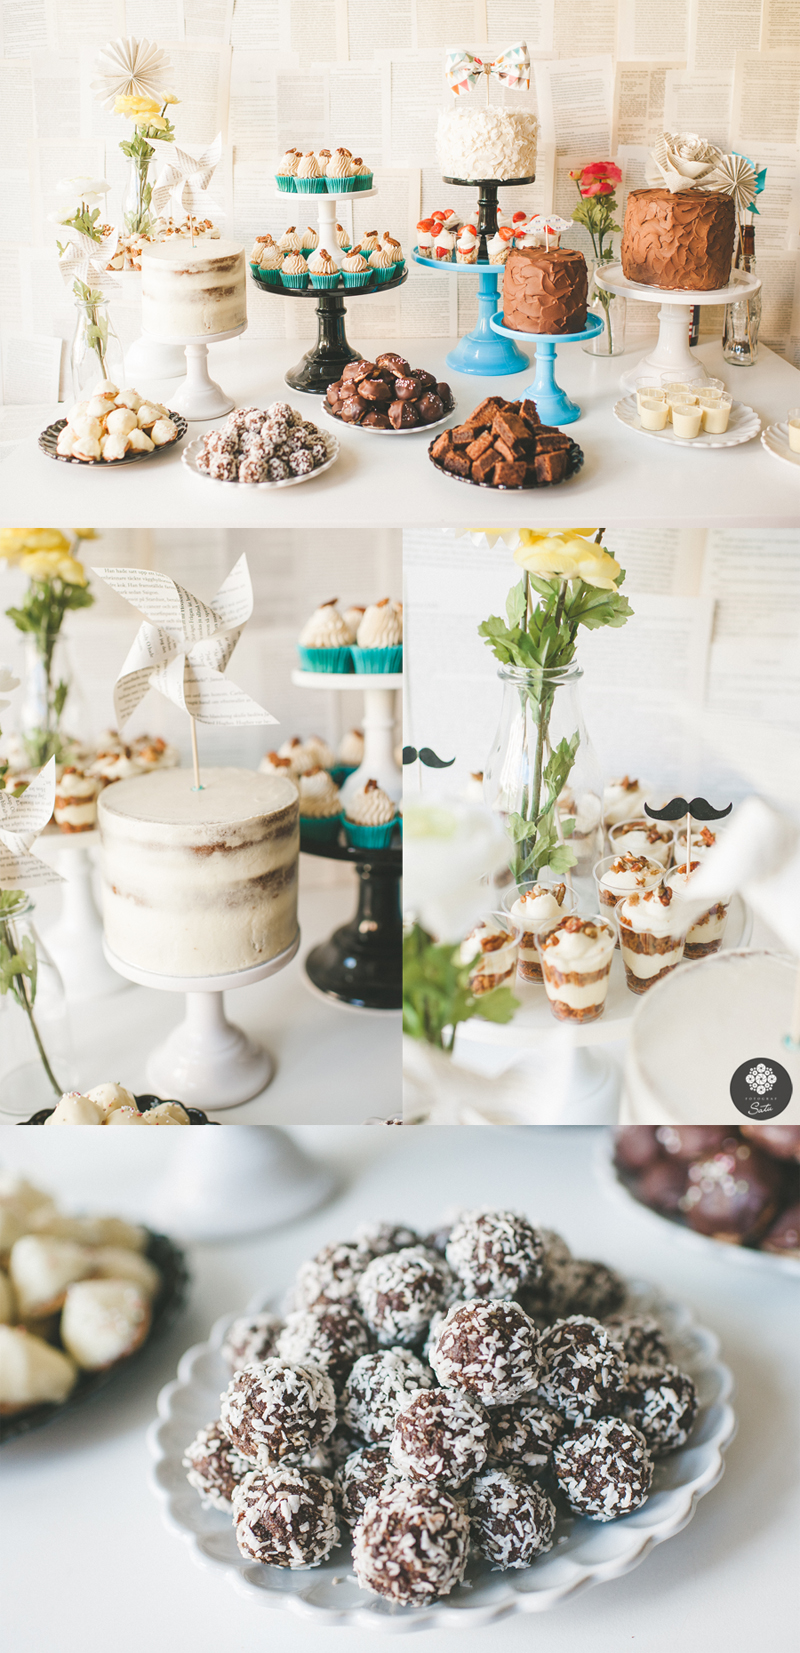 dessertbord 1